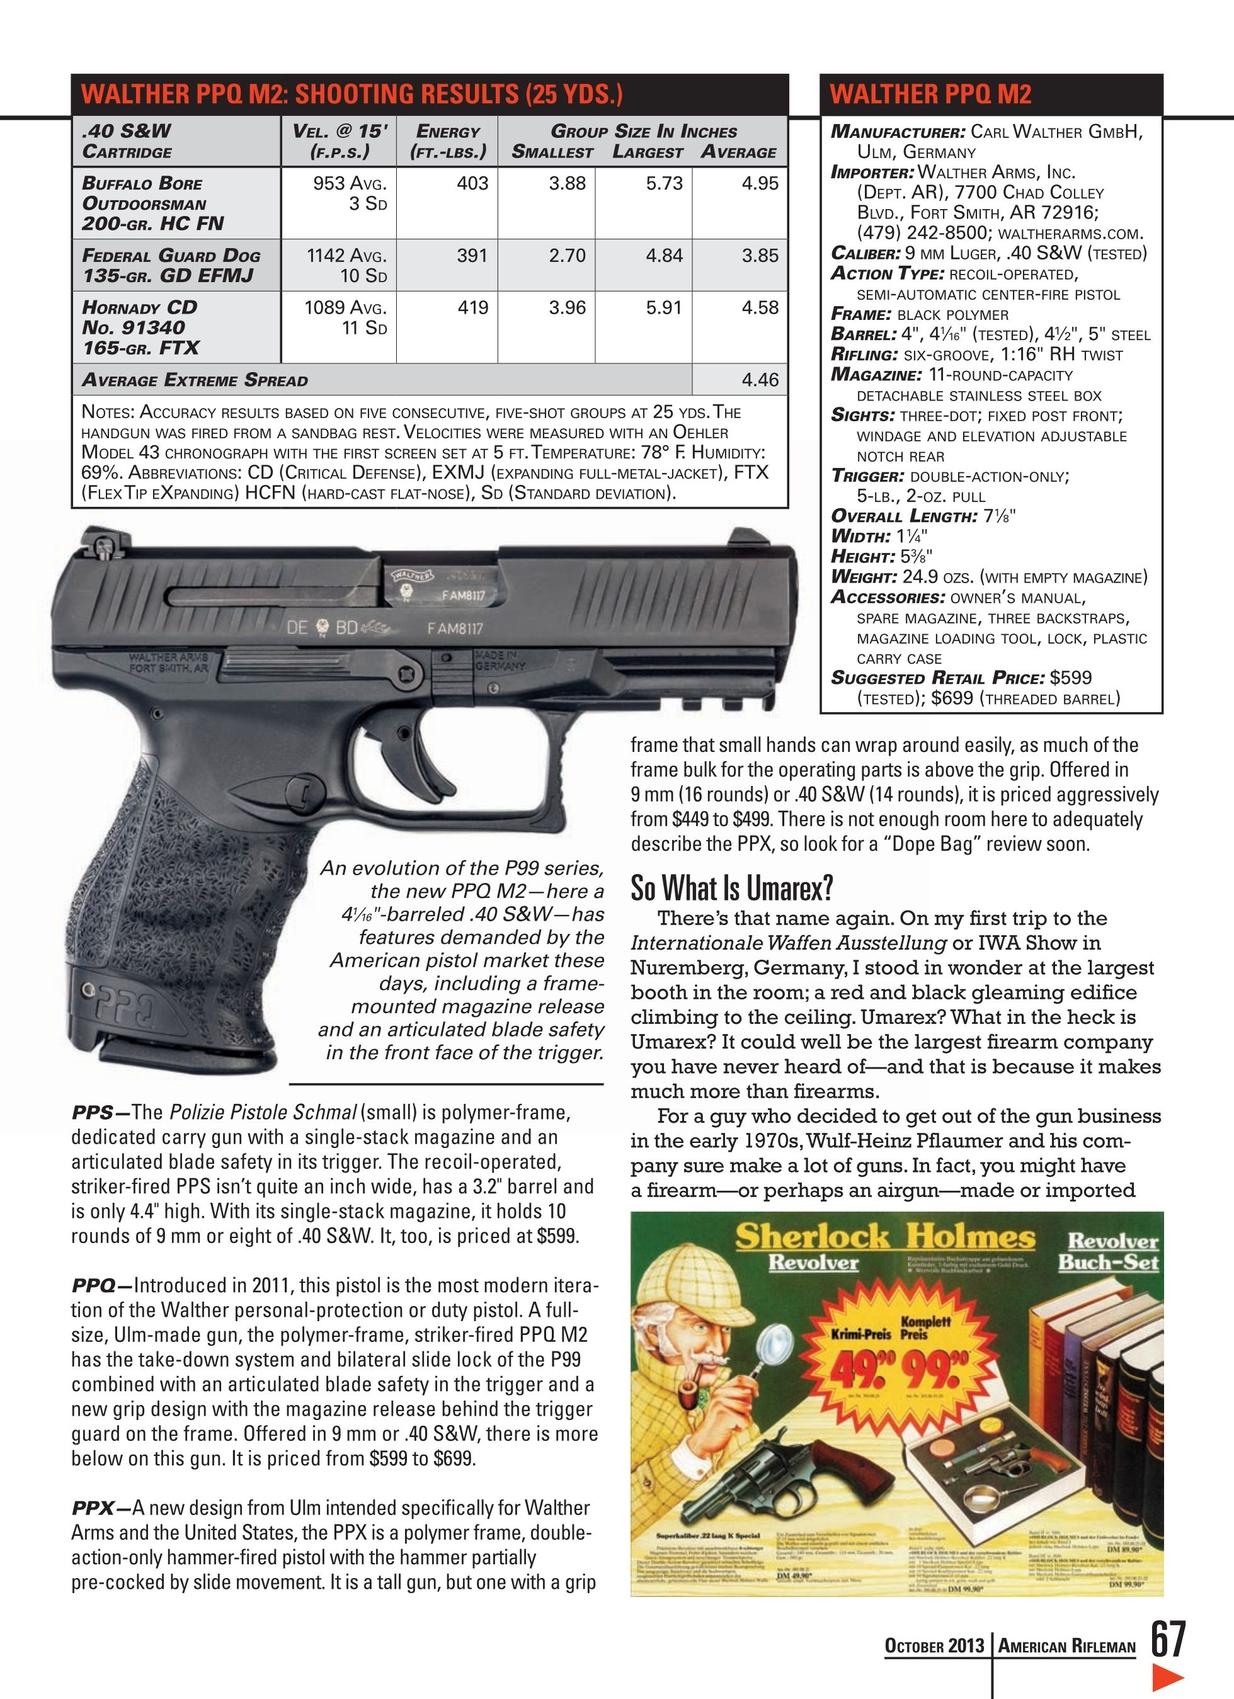 American Rifleman - October 2013